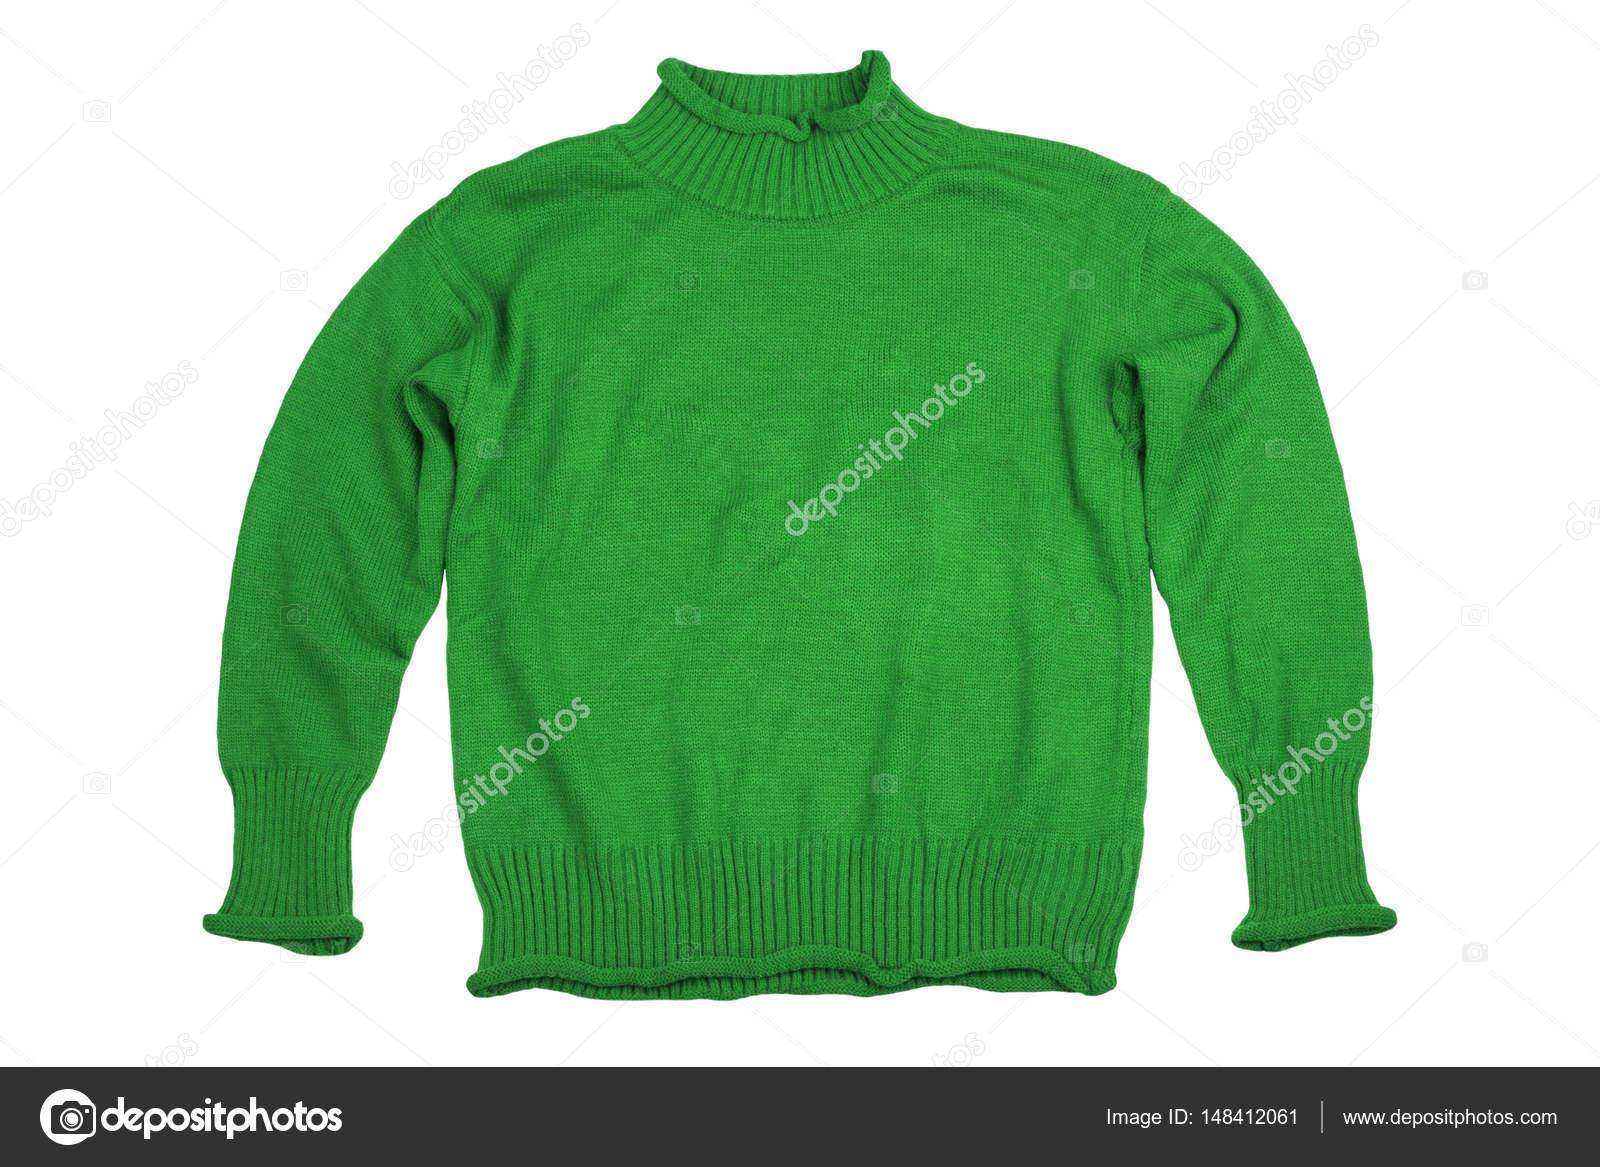 e7aebe400 Camisolas de gren moda roupas para temporada de inverno isolada no whi —  Fotografia de Stock